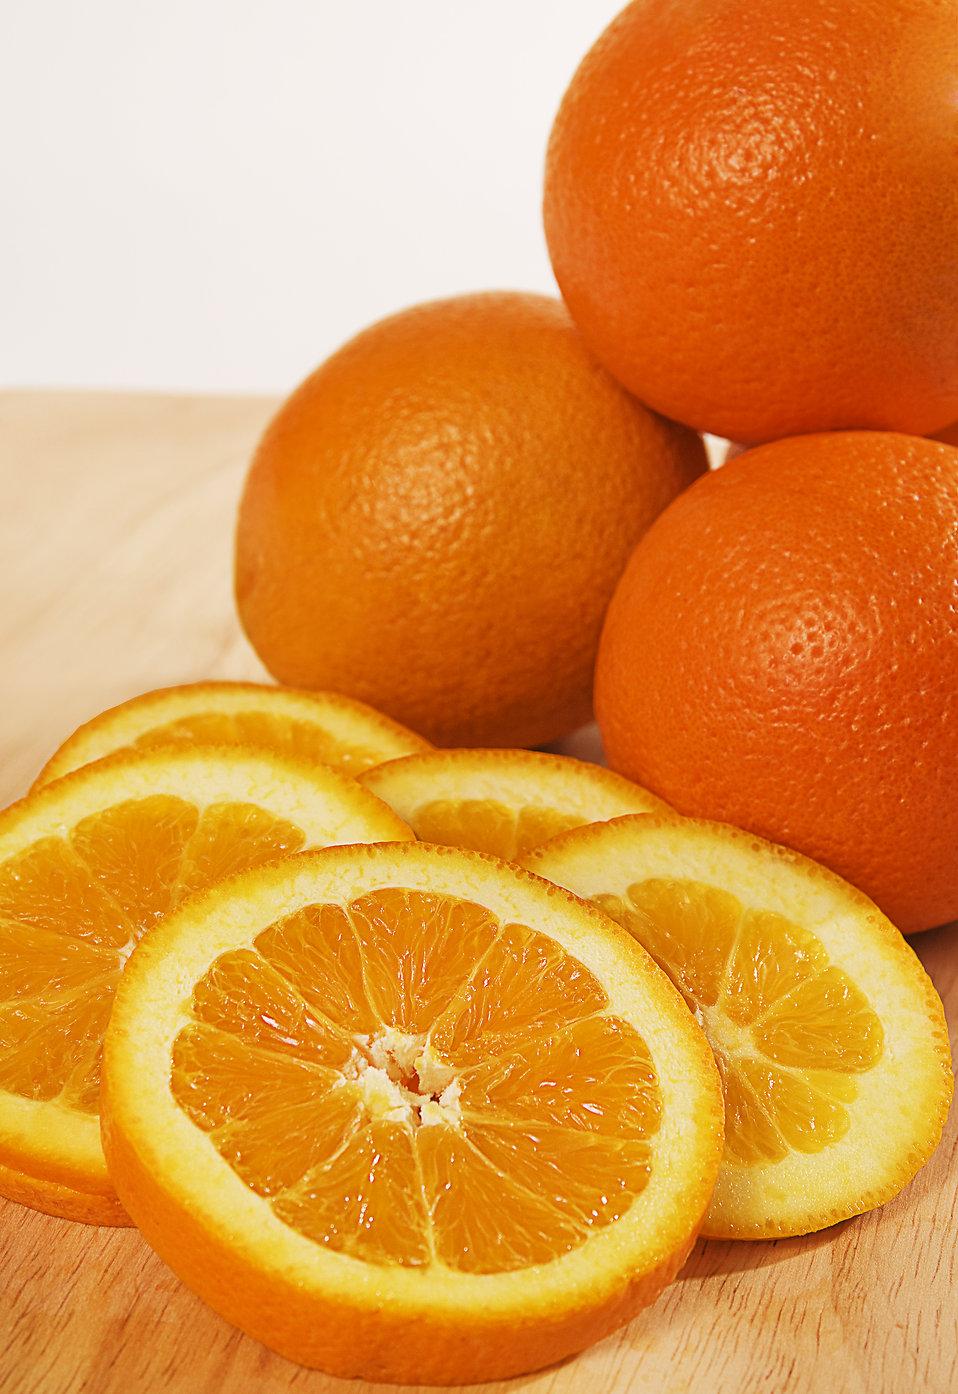 Orange slices on a cutting board : Free Stock Photo